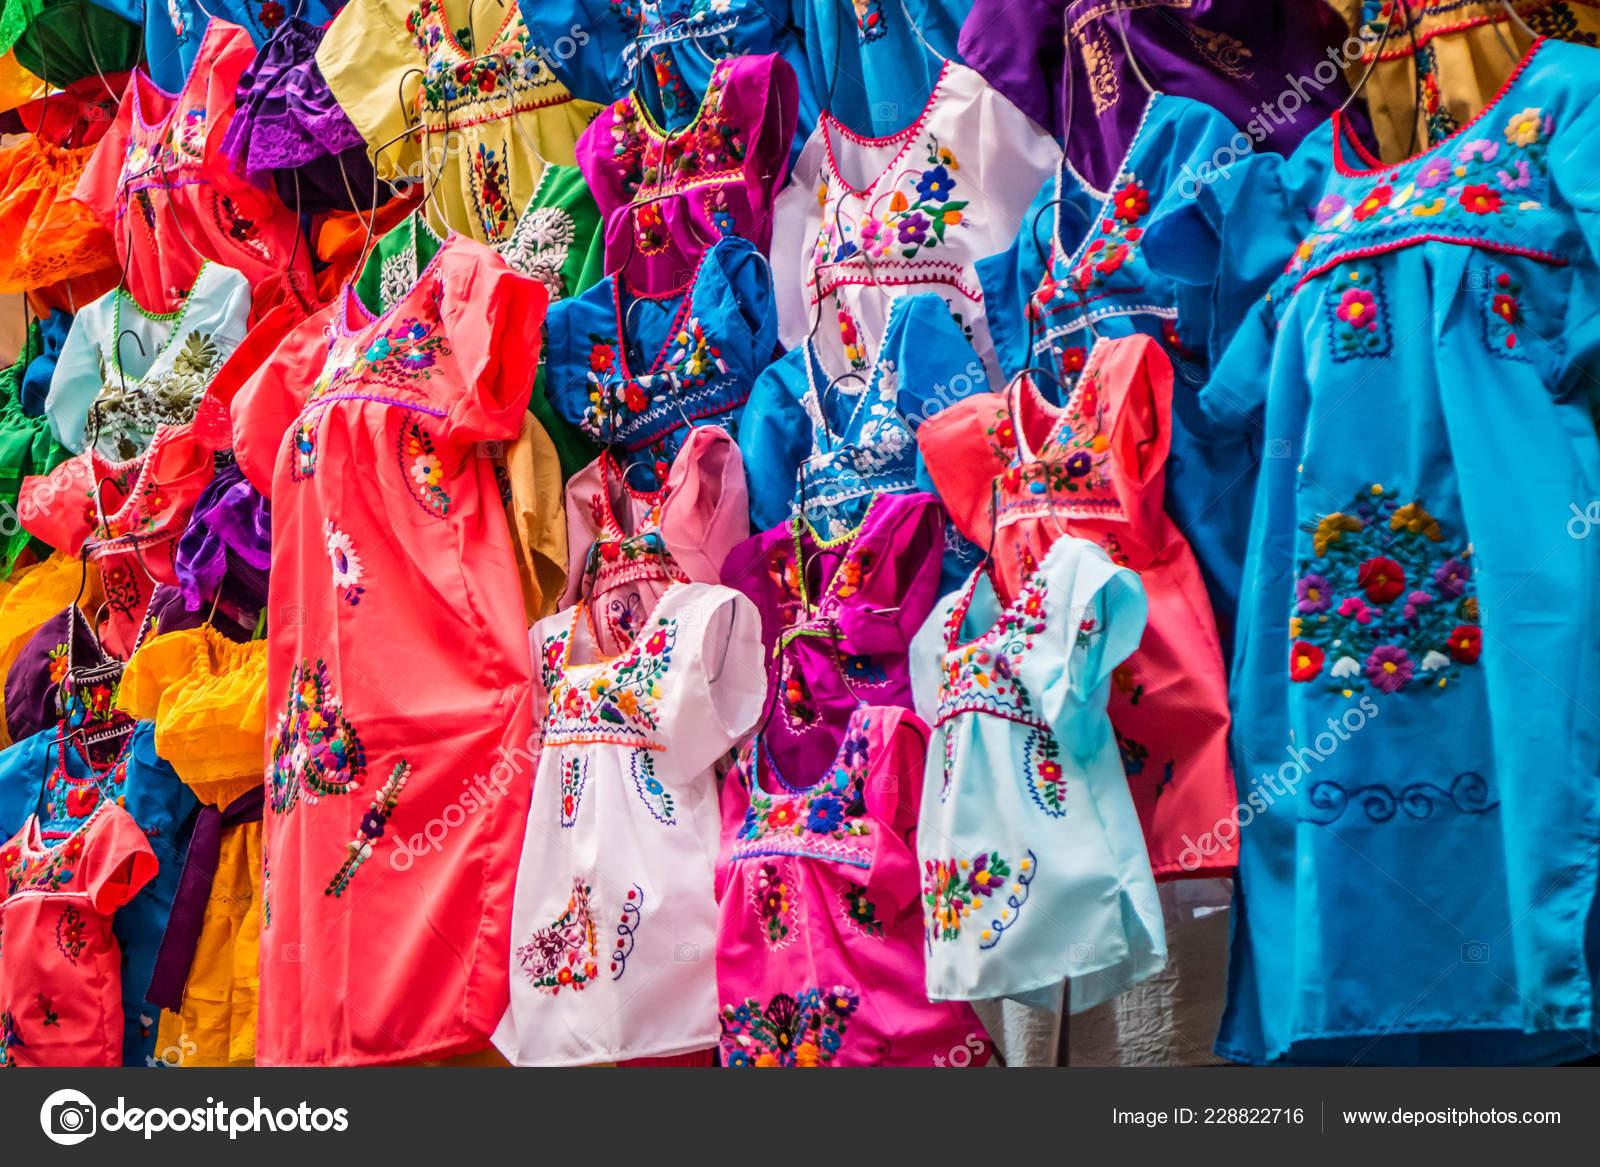 8f84208c7e90 Ένα Παραδοσιακό Μεξικάνικο Ρούχα Progreso Nuevo Μεξικό — Φωτογραφία ...